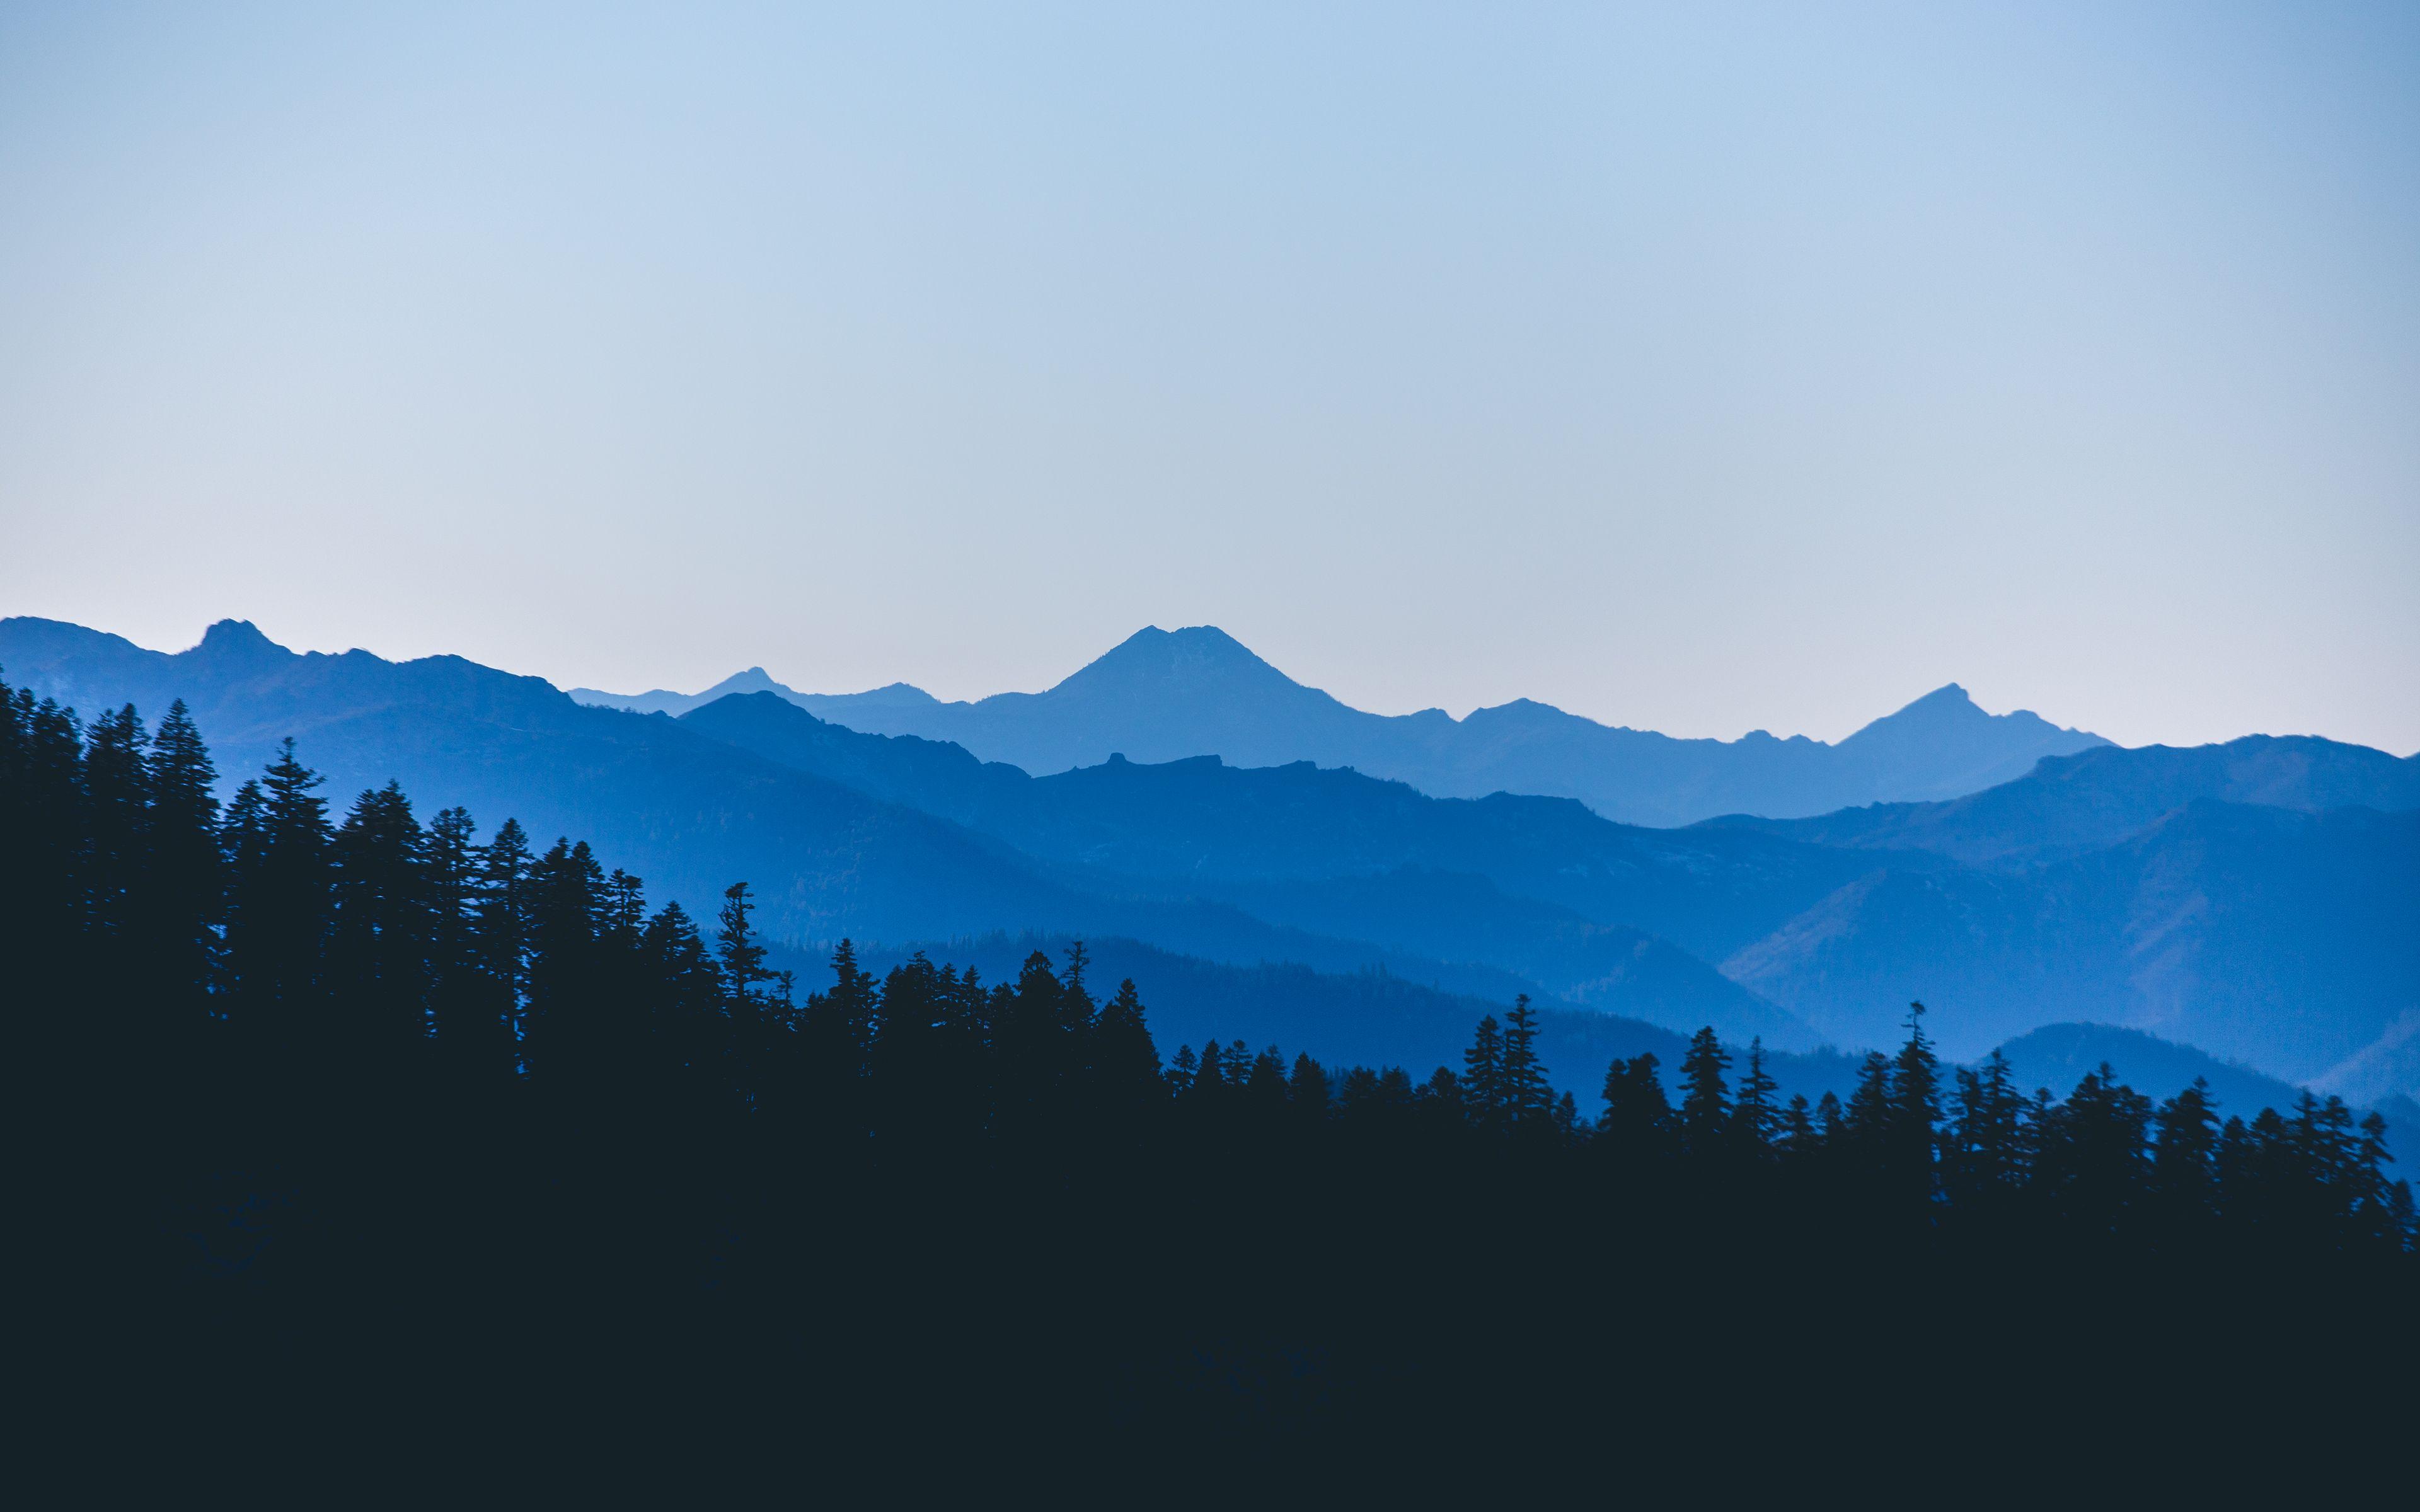 Relaxing HD Wallpapers - Minimal Nature Panorama